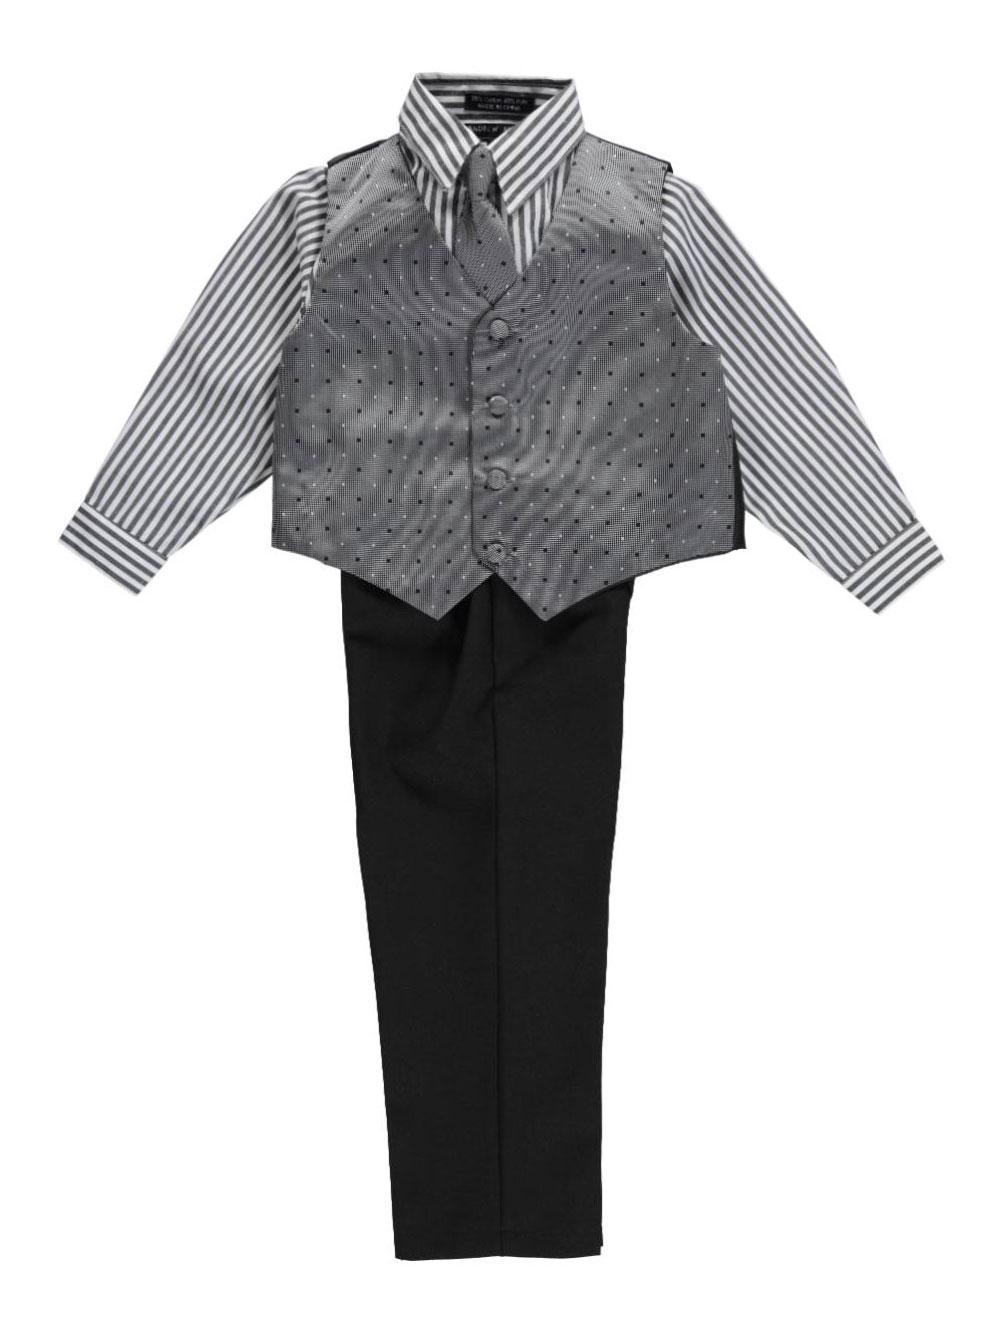 Image of Andrew Fezza Little Boys Salt  Pepper Square 4Piece Vest Set Sizes 4  7  black 5